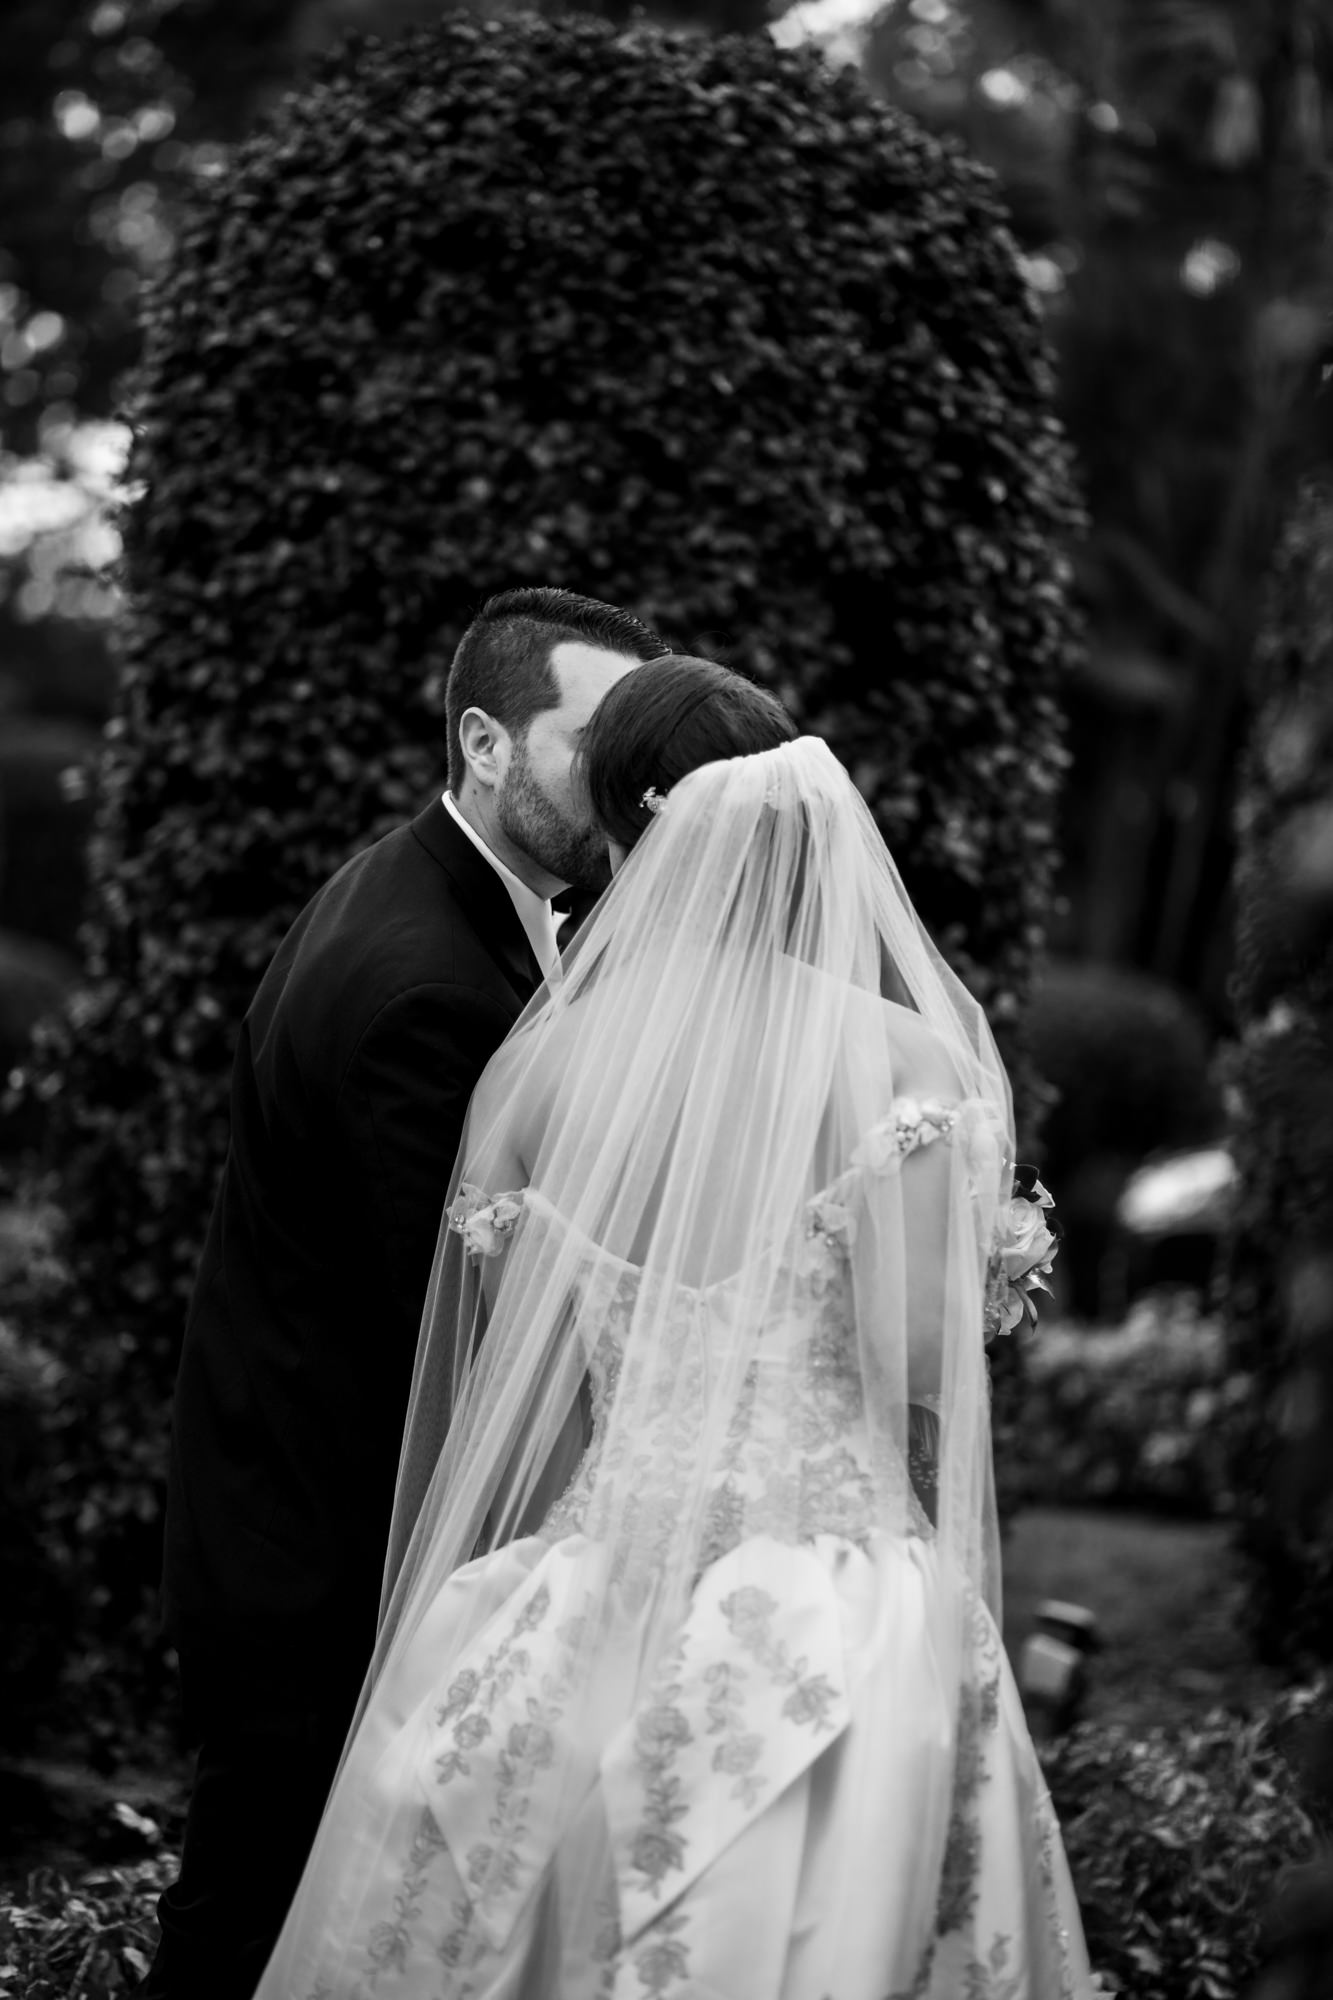 Benvenuto_Wedding_catholic_Florida_Bride-Groom-73.jpg